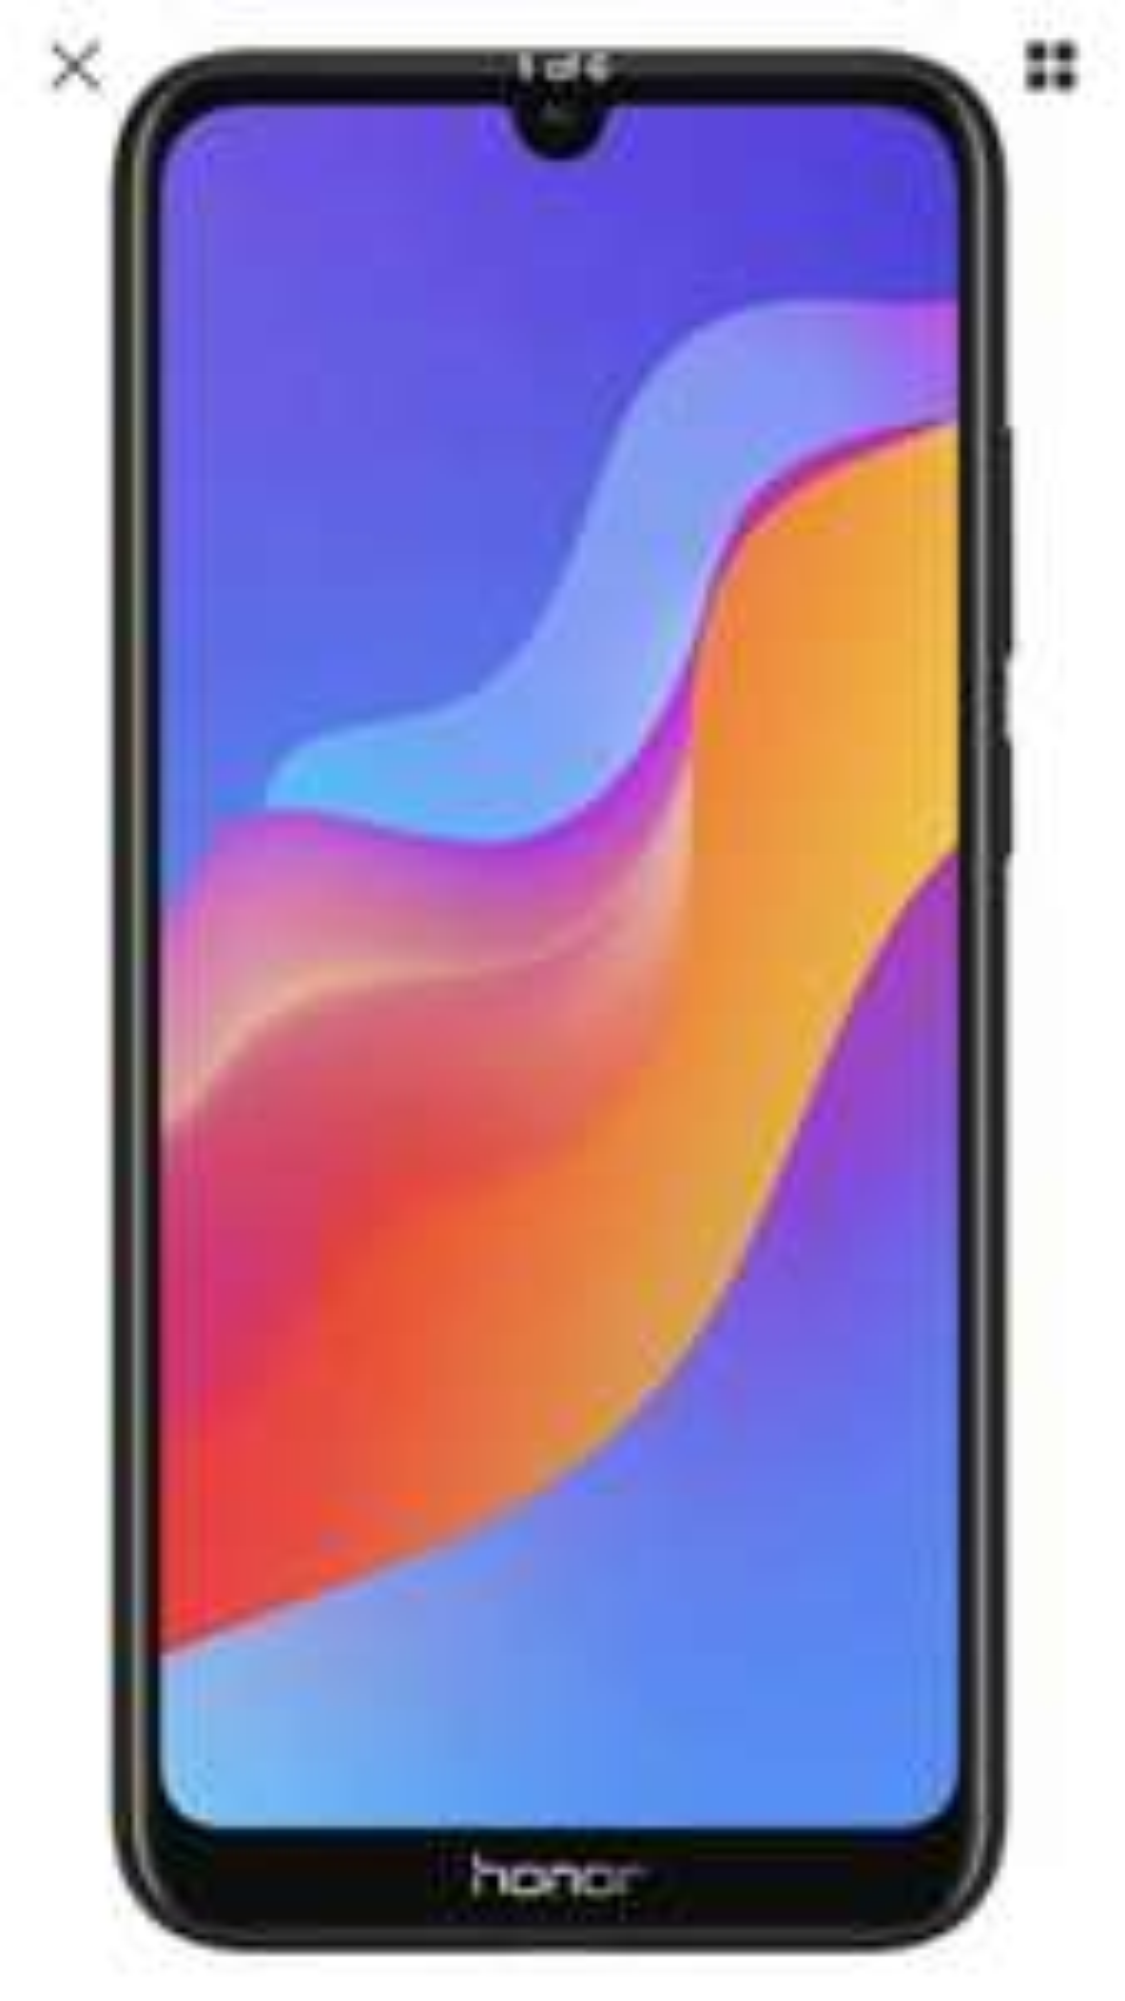 Refurbished Sim Free Honor 8A 6.08 Inch 32GB 13MP 4G Mobile Phone - Black Dual Sim - £96.99 delivered @ Argos / eBay